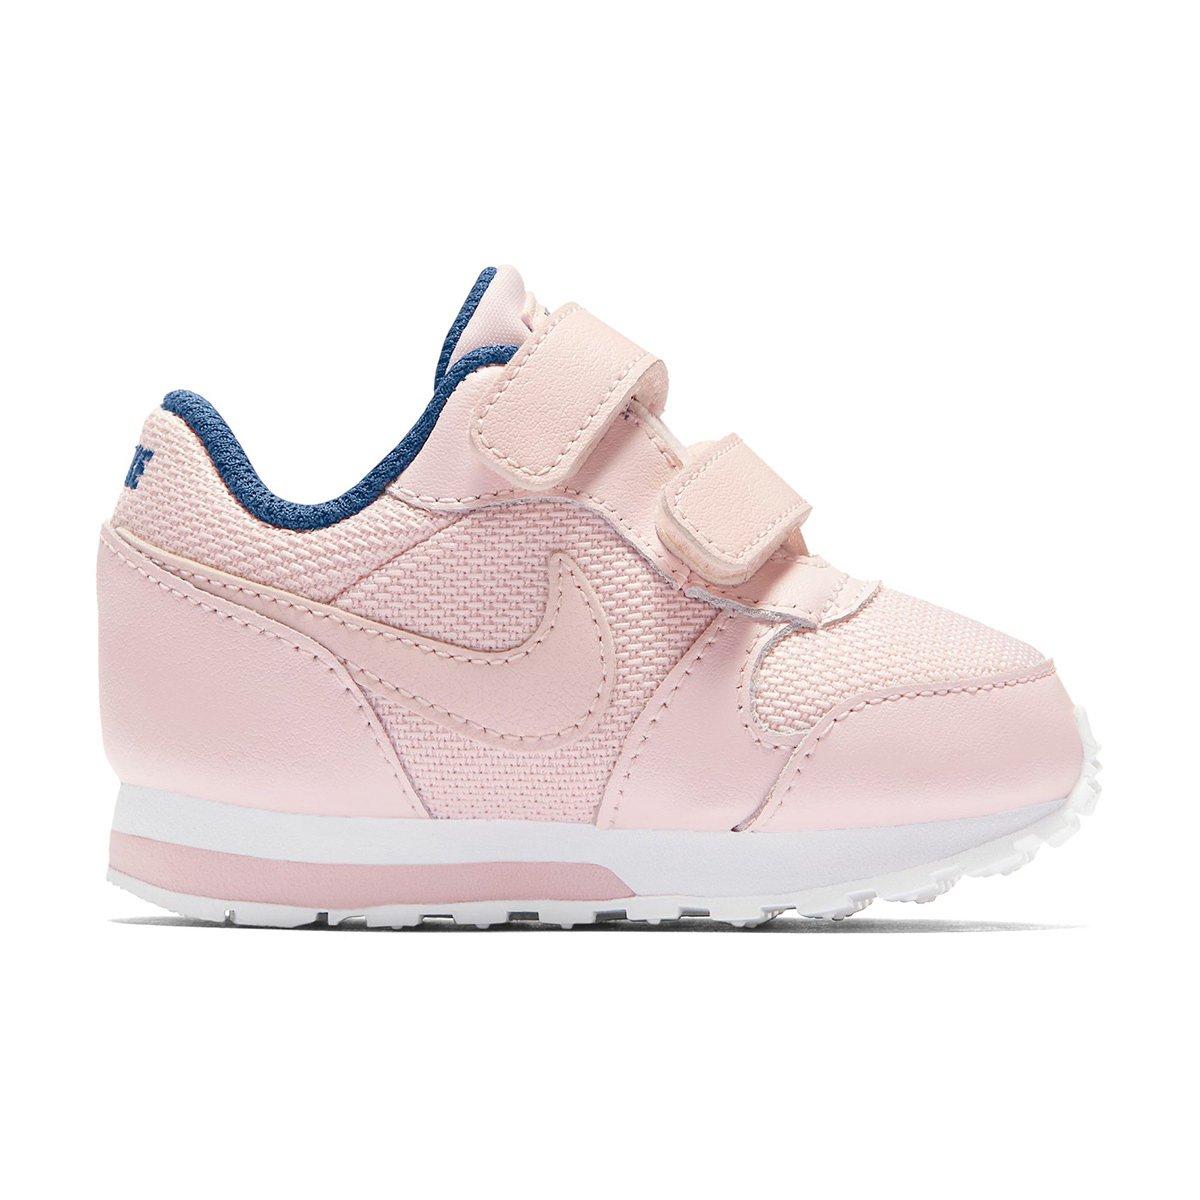 5c9531a5331ae Tênis Infantil Nike Md Runner 2 - Rosa e Azul | Netshoes